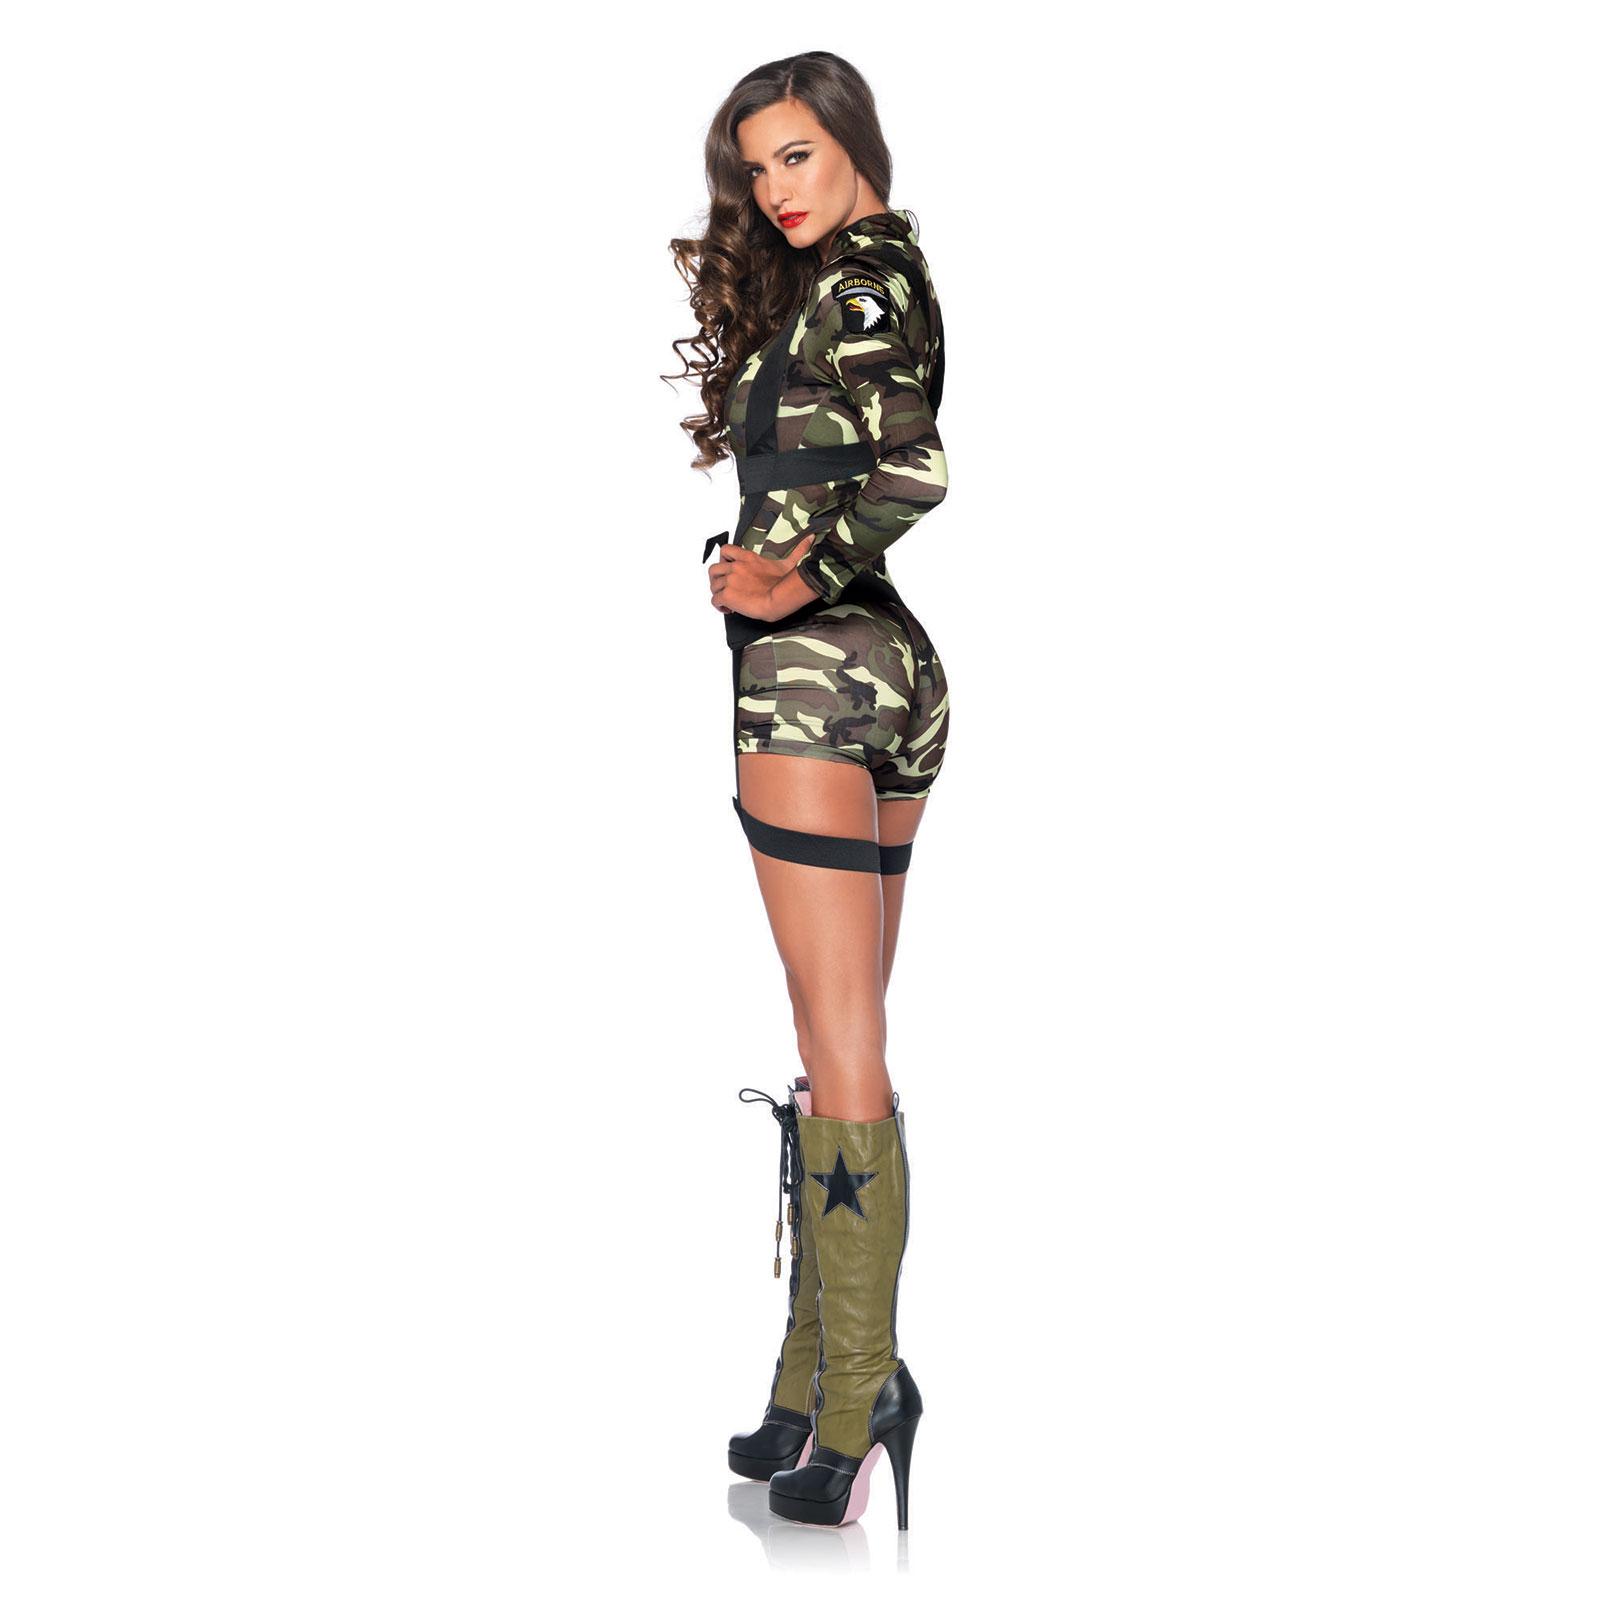 Women\'s Goin Commando Army Camouflage Halloween Costume Romper ...